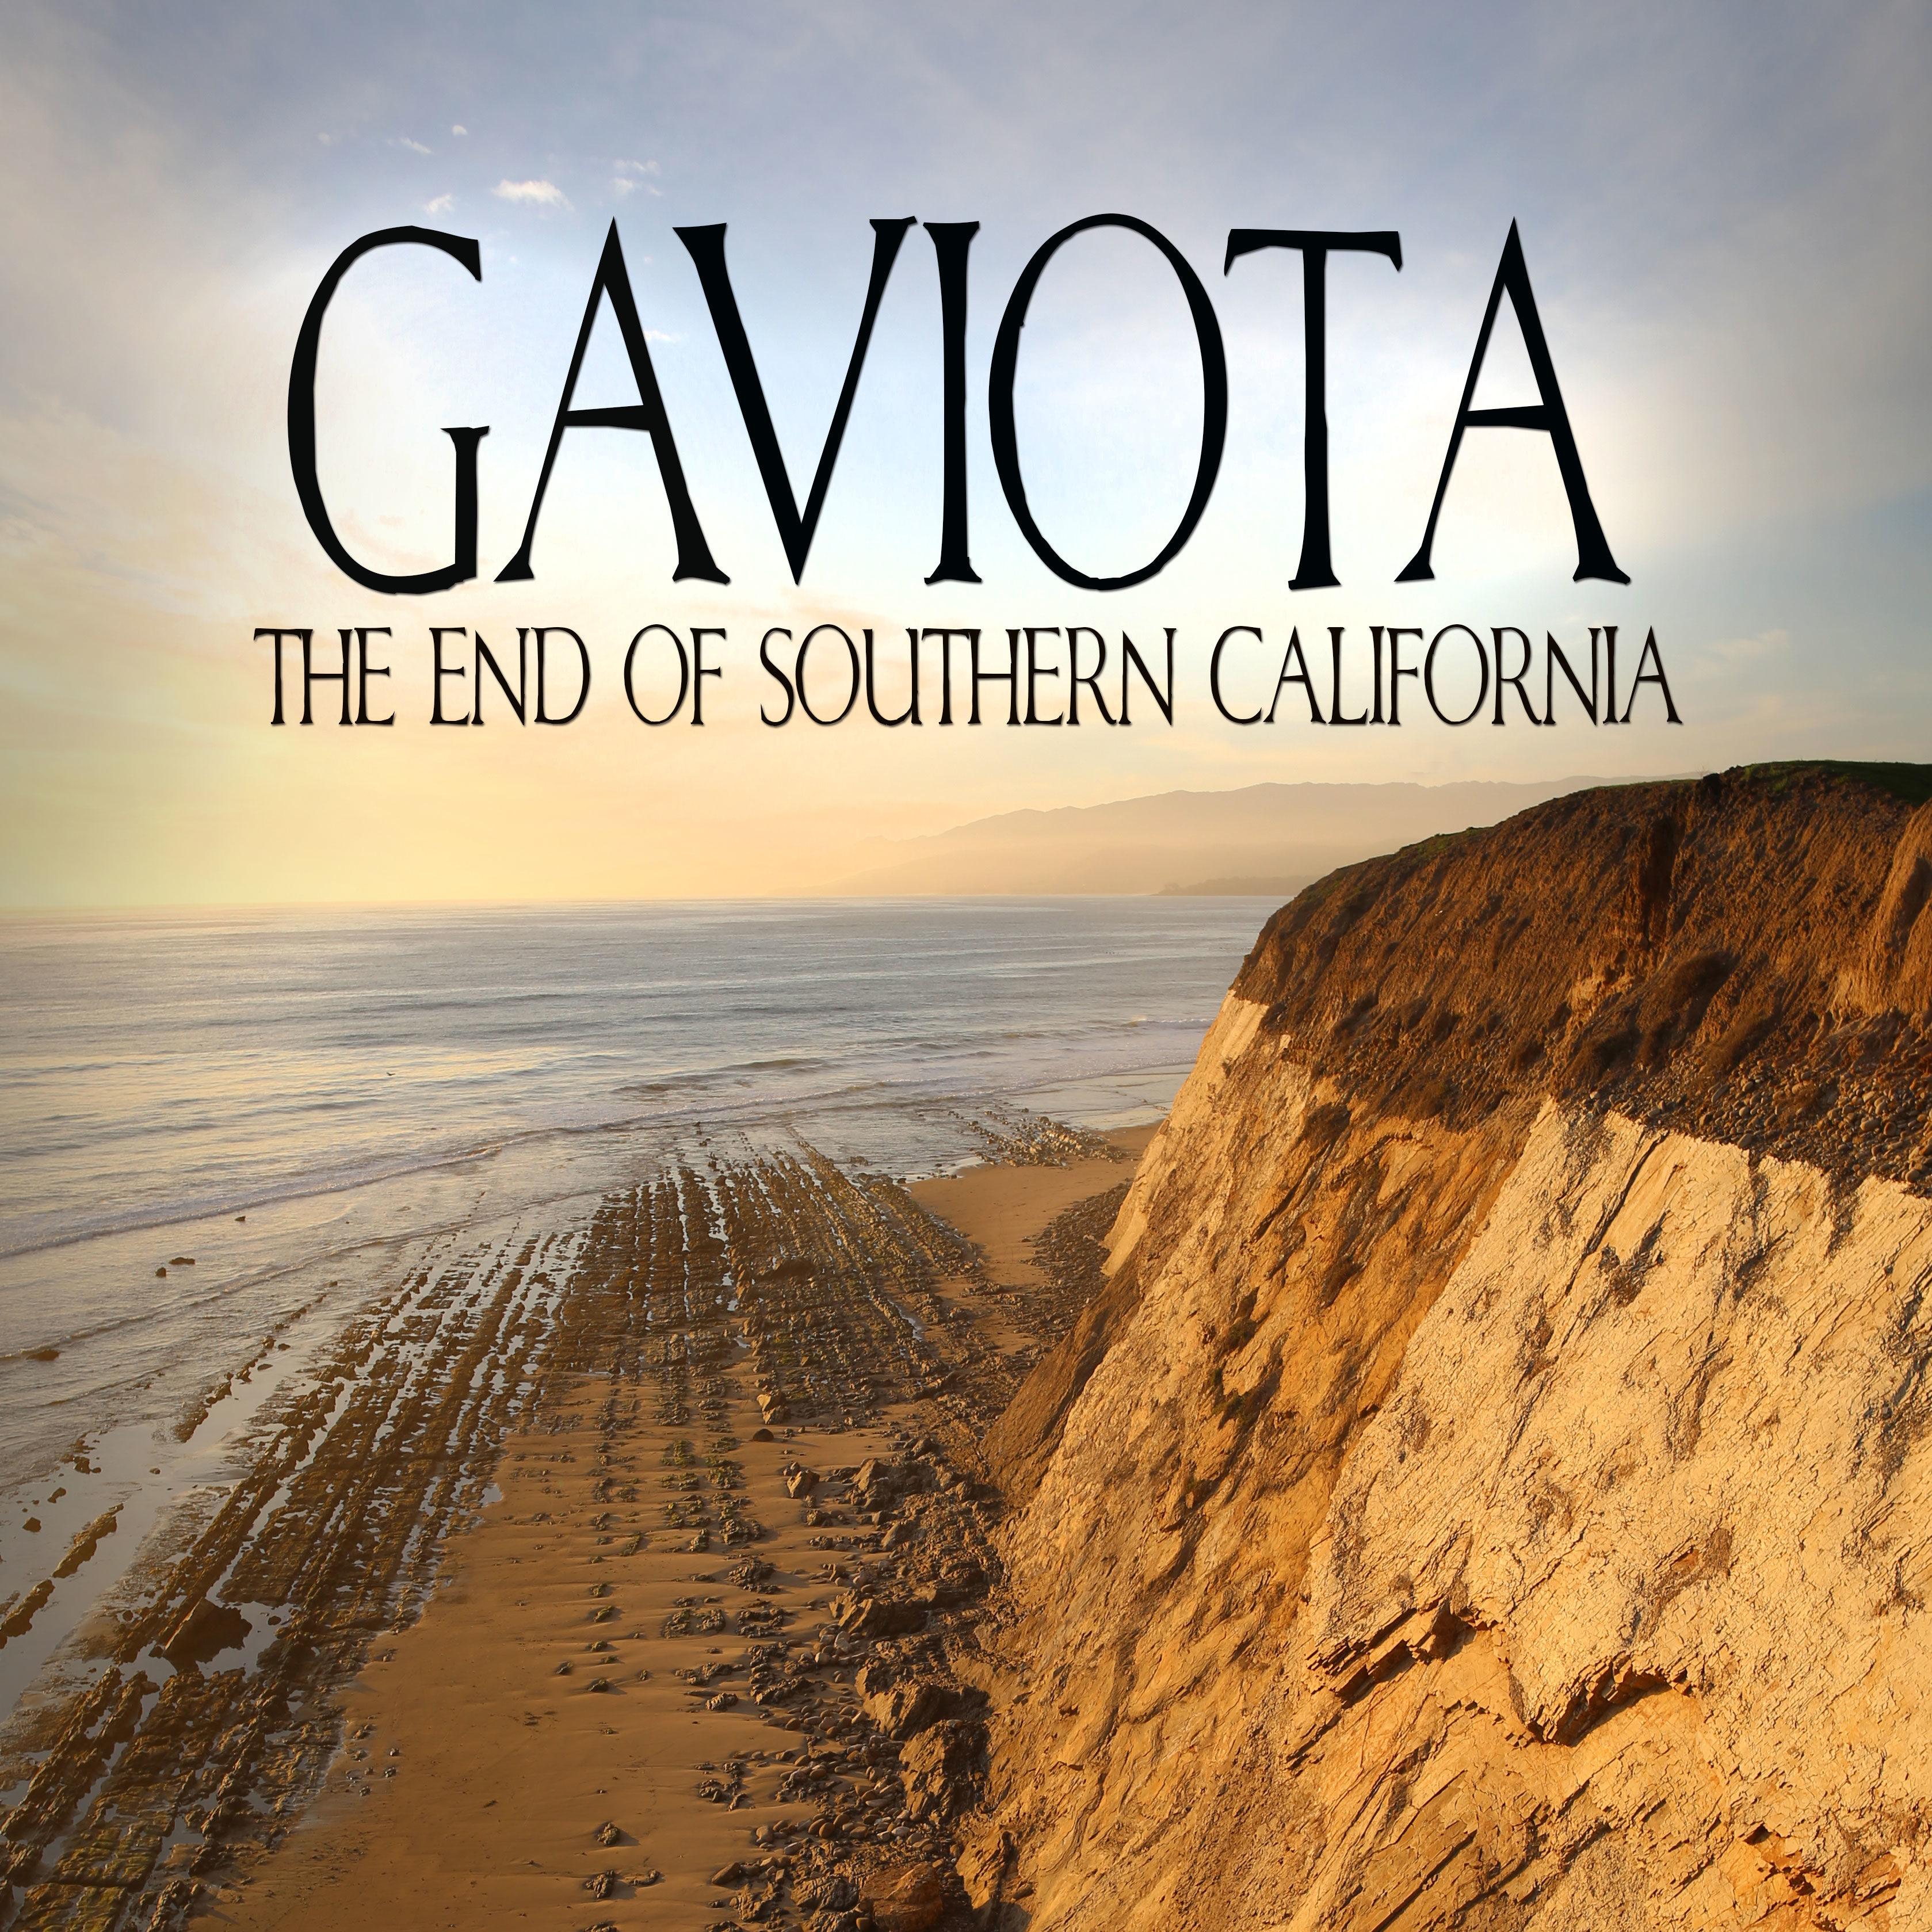 Gaviota Poster CROP E1494195054343